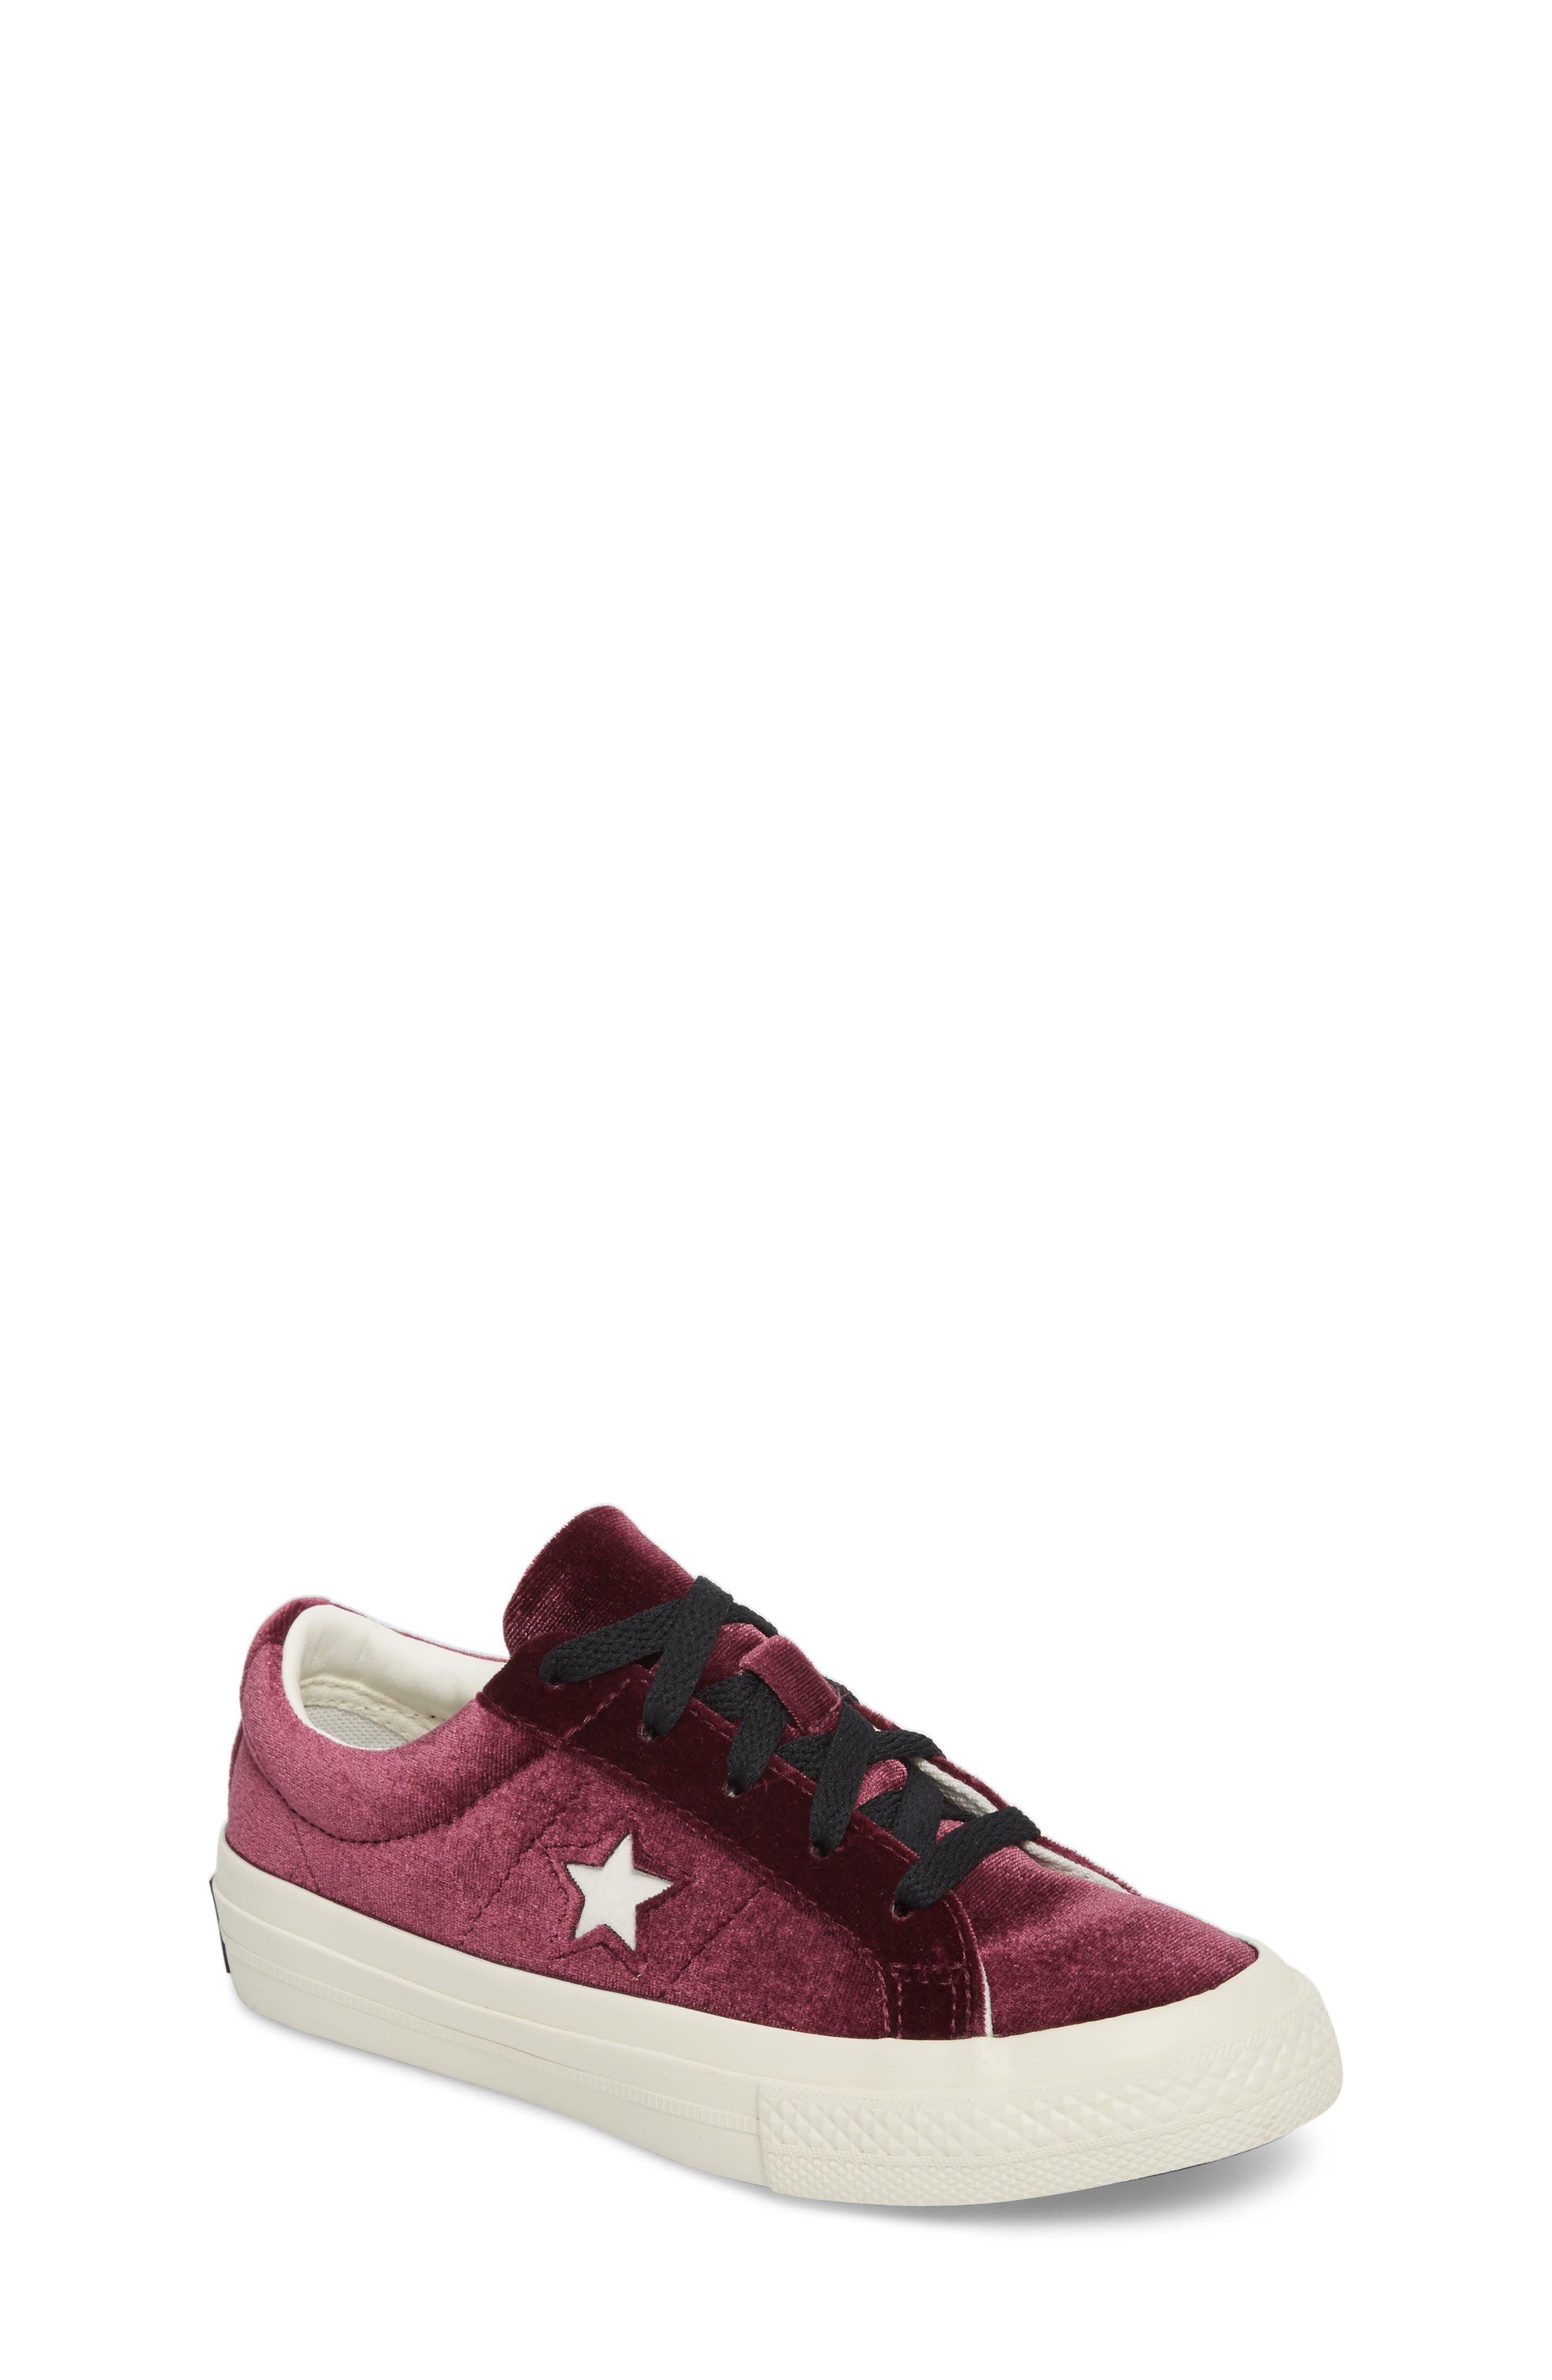 Chuck Taylor<sup>®</sup> All Star<sup>®</sup> One Star Velvet Platform Sneaker,                             Main thumbnail 1, color,                             Sangria Velvet